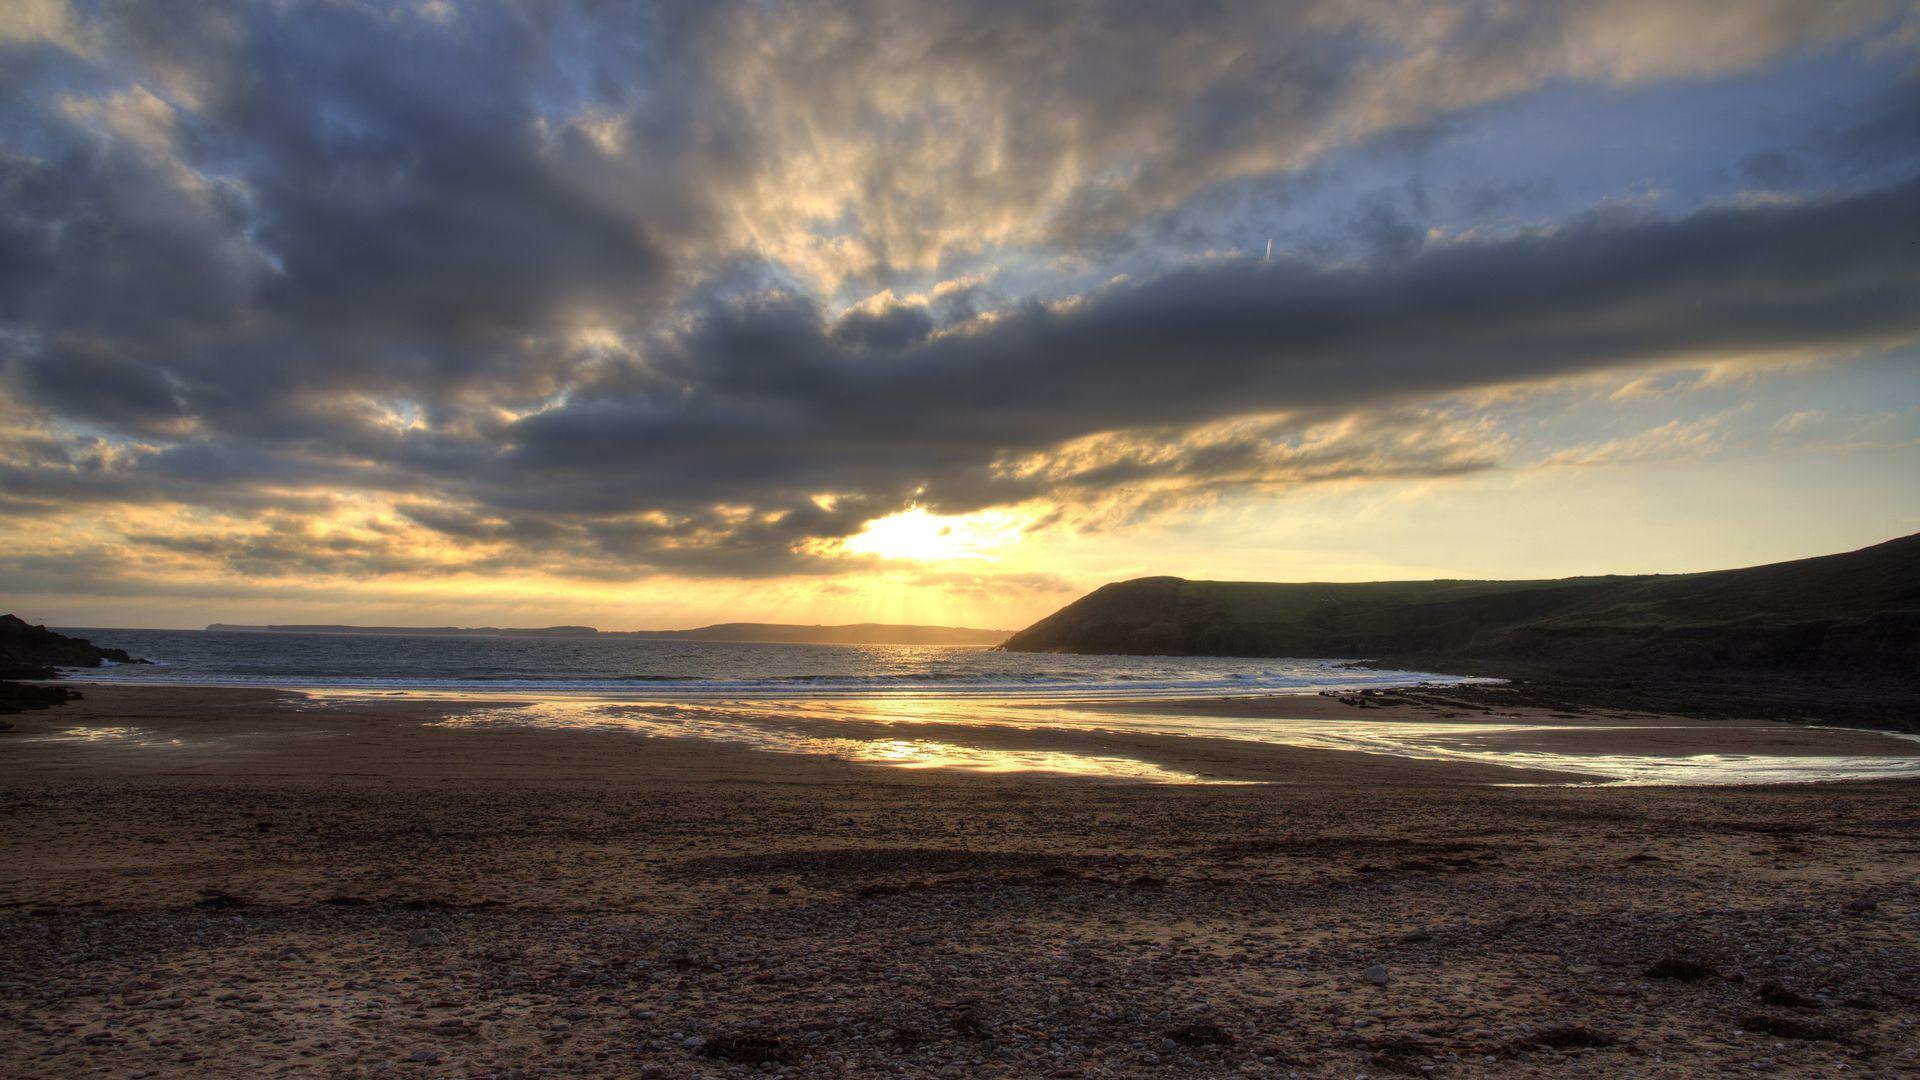 1920x1080 Wallpaper shore, water, sunset, landscape